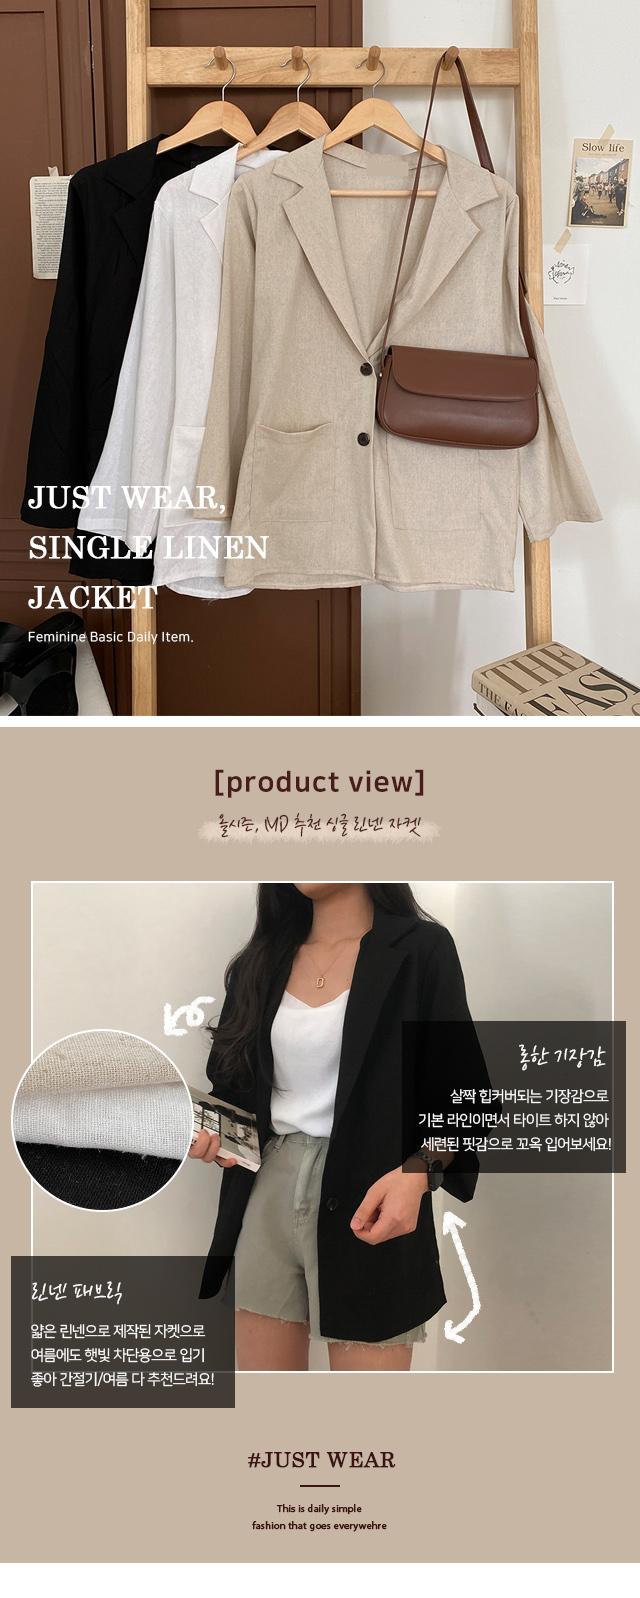 Single two-button linen jacket